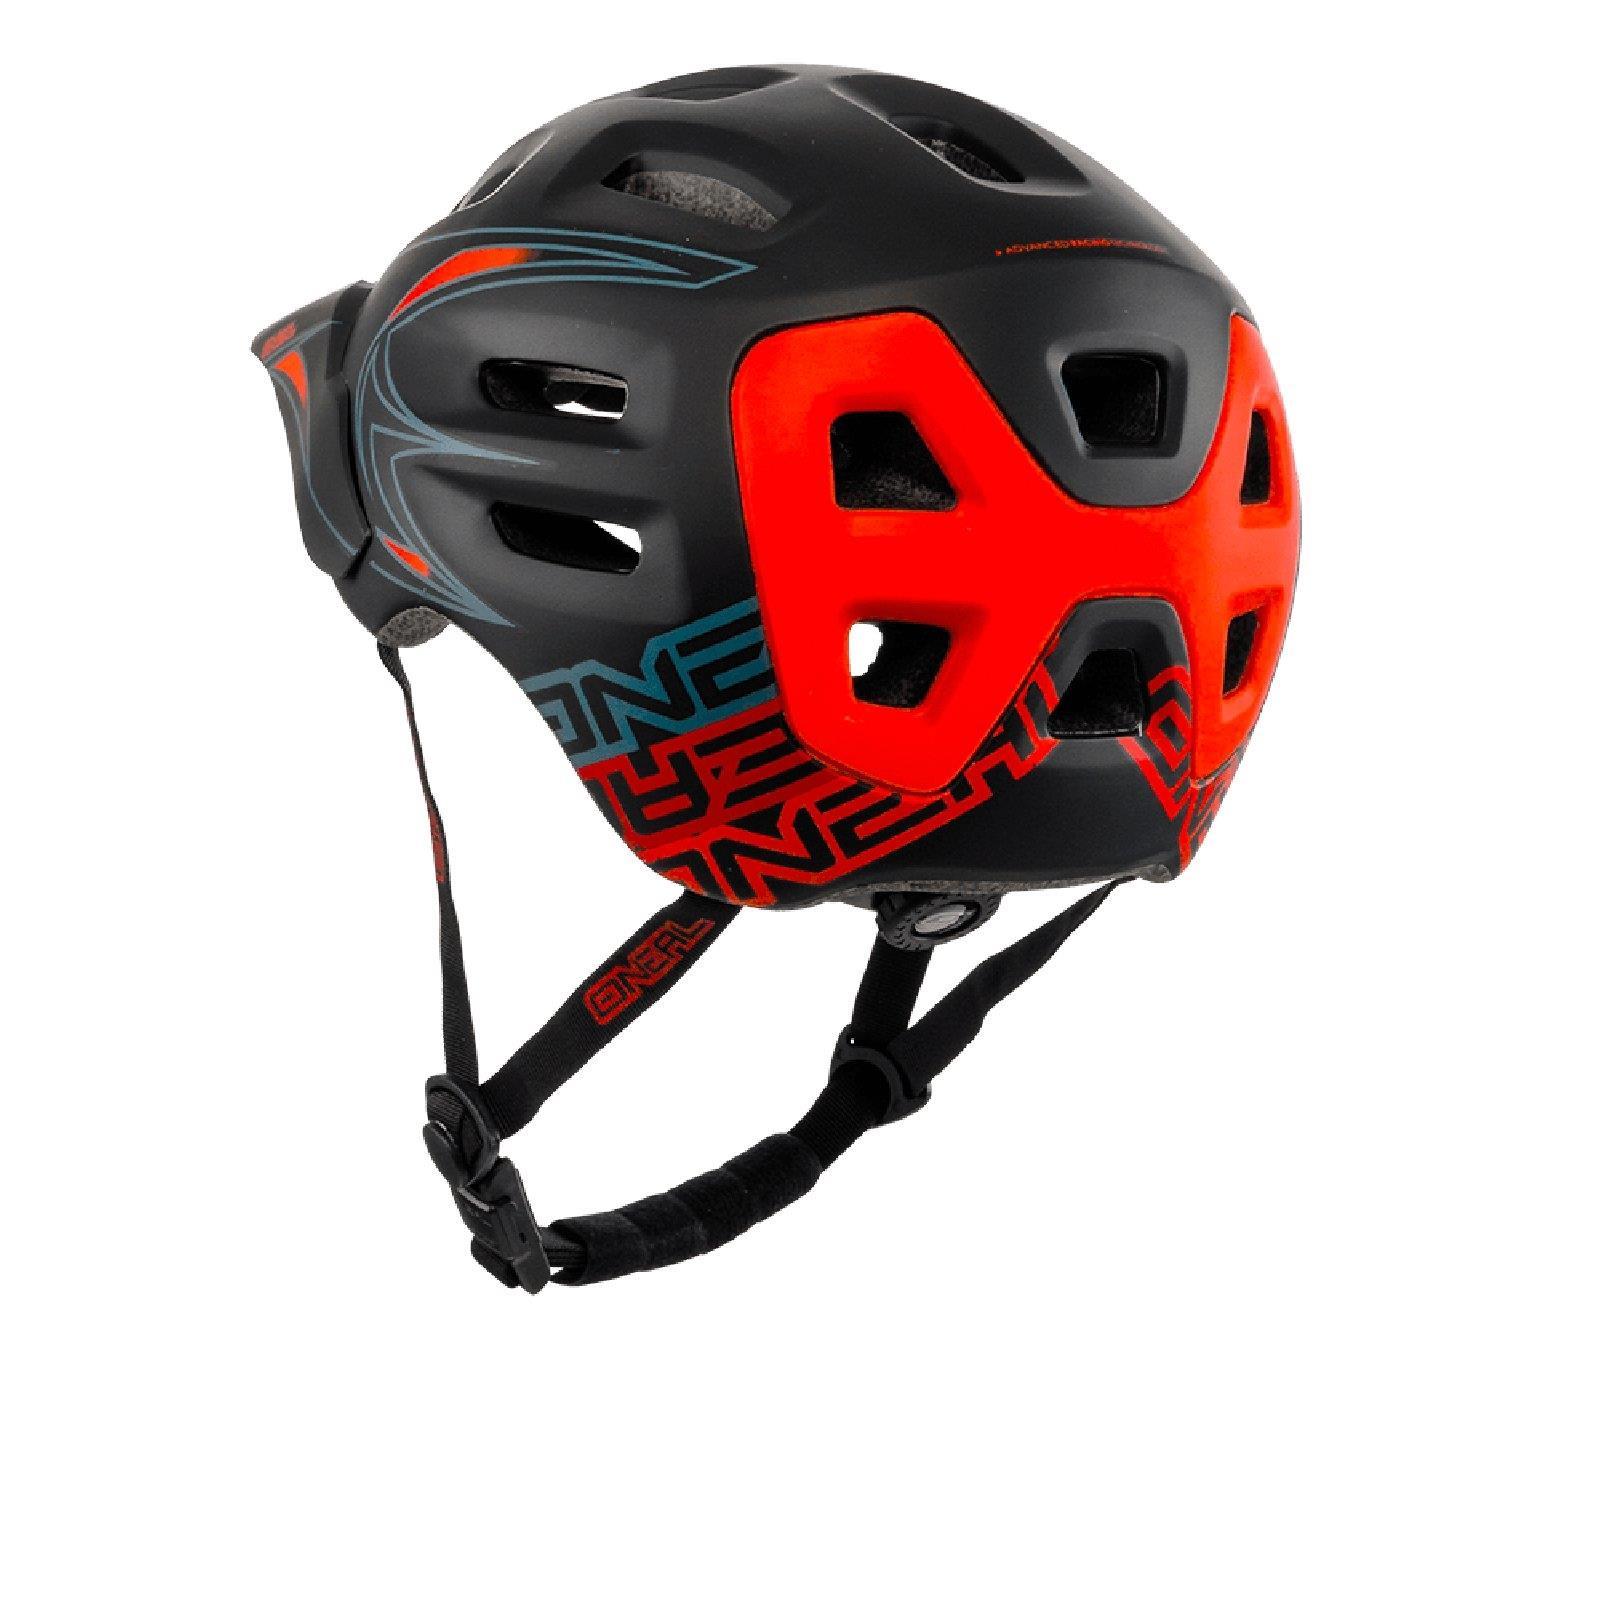 oneal defender fahrrad helm all mountain enduro mountain. Black Bedroom Furniture Sets. Home Design Ideas